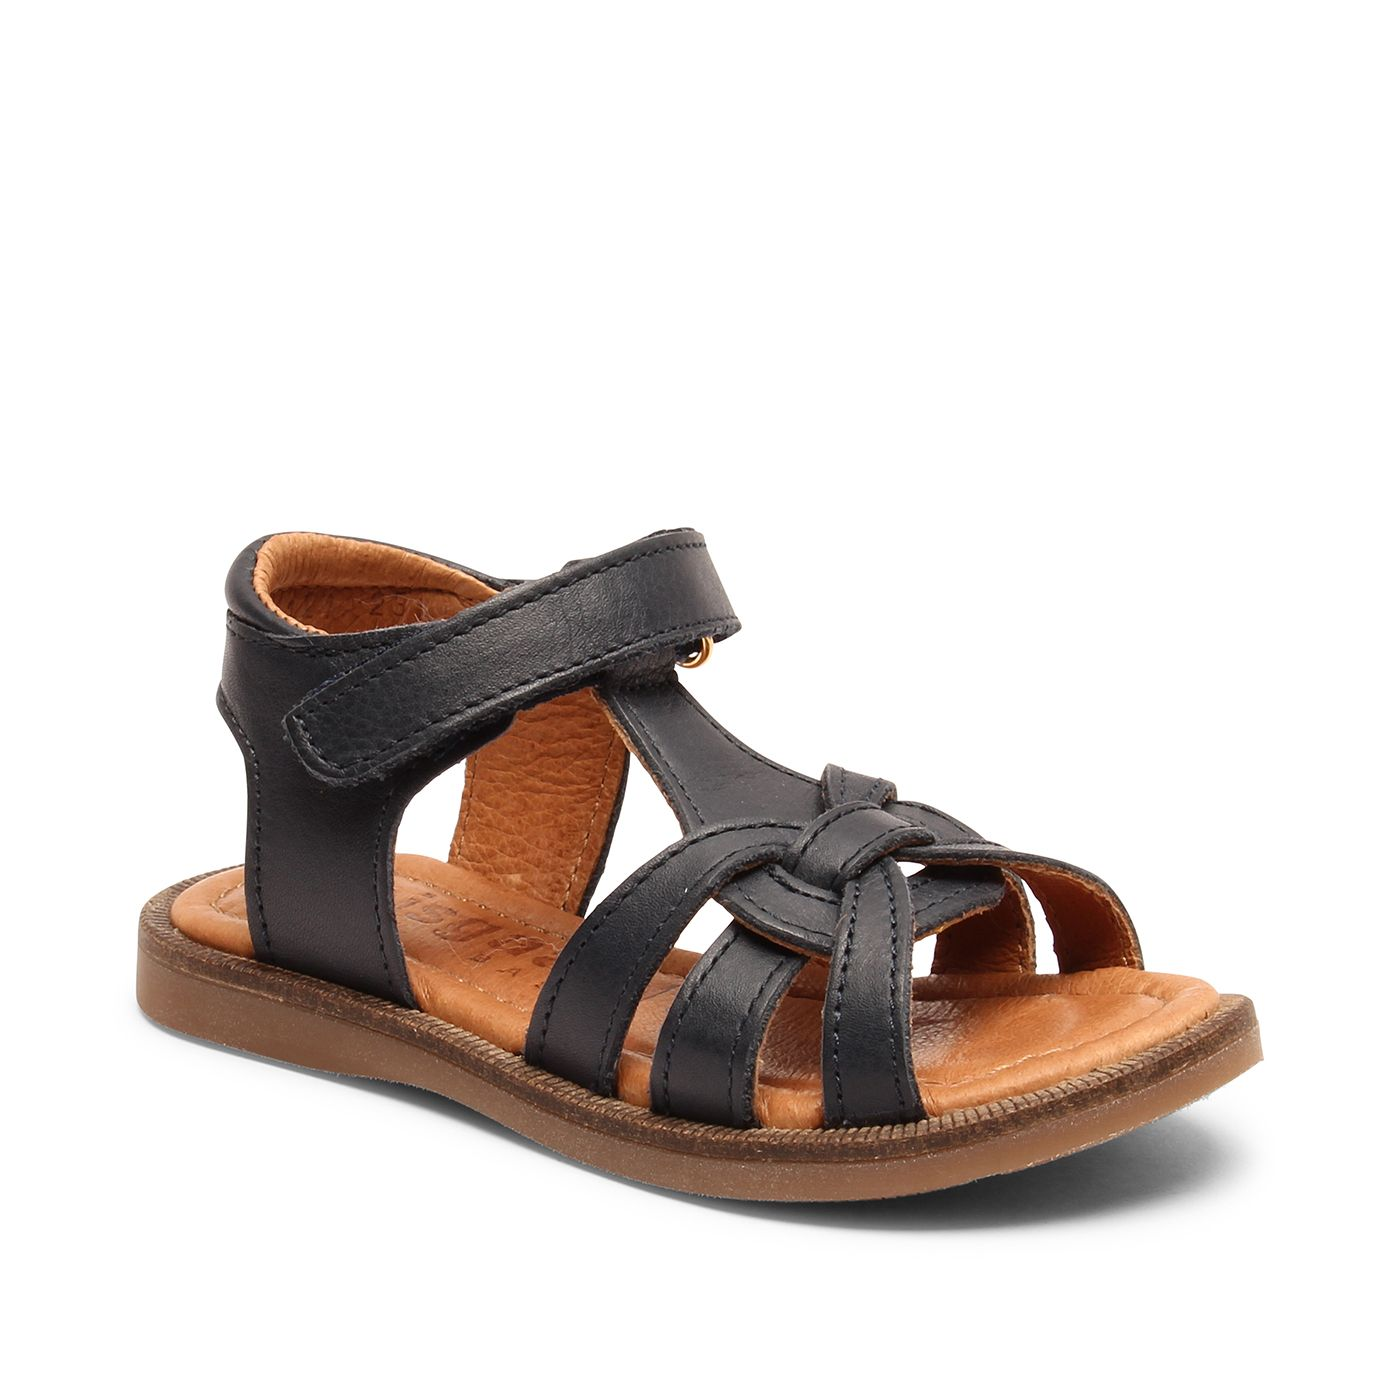 Bisgaard dívčí kožené sandály 70707 - 1428